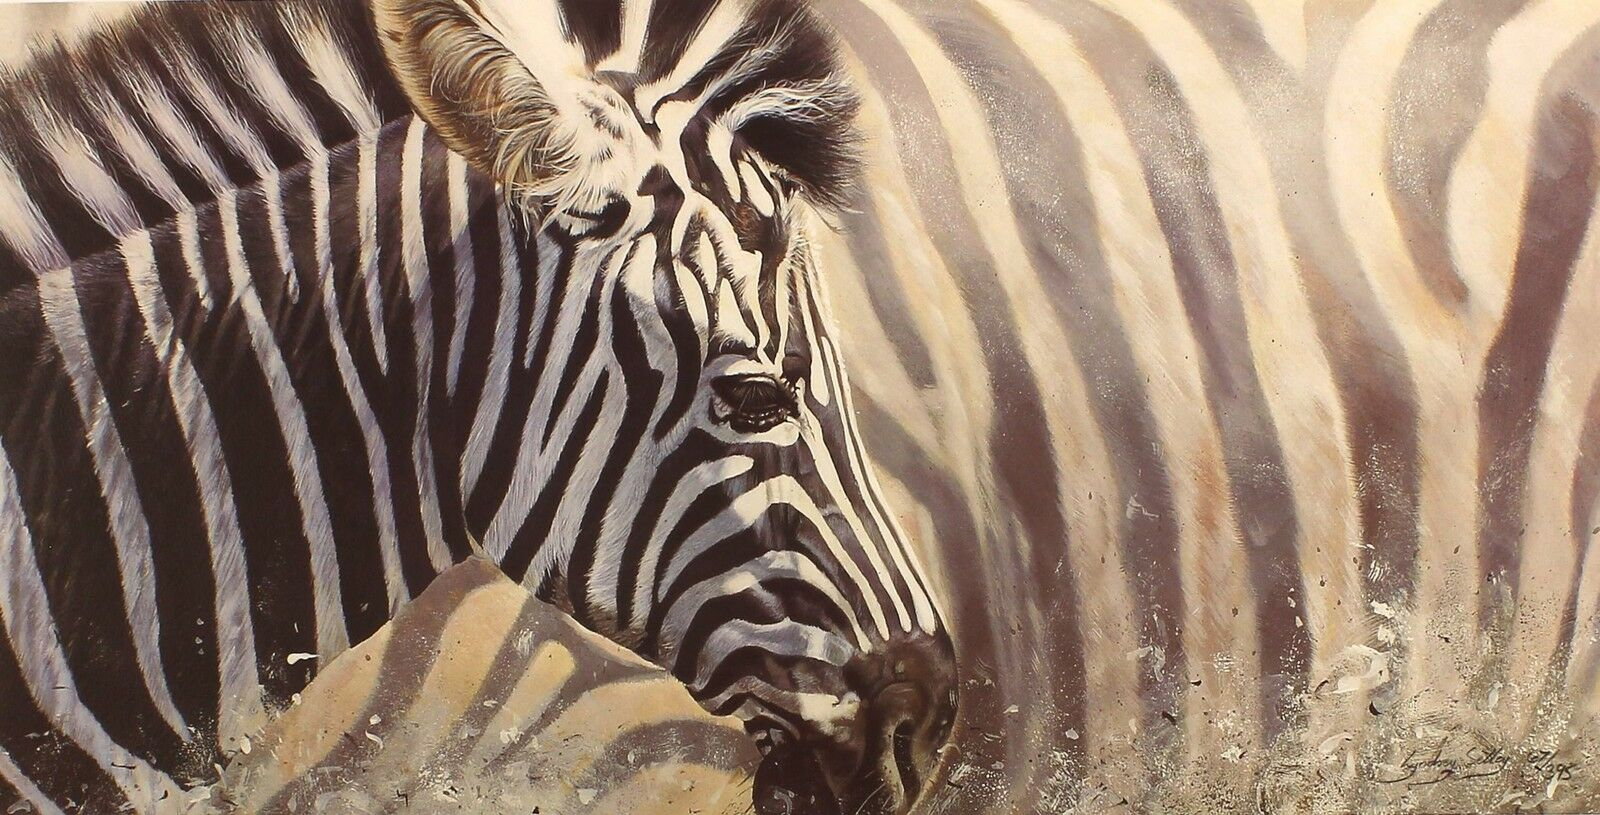 Lyndsey Selley  mix & match  zebra afrique signé ltd ed taille  39cm x 65cm neuf